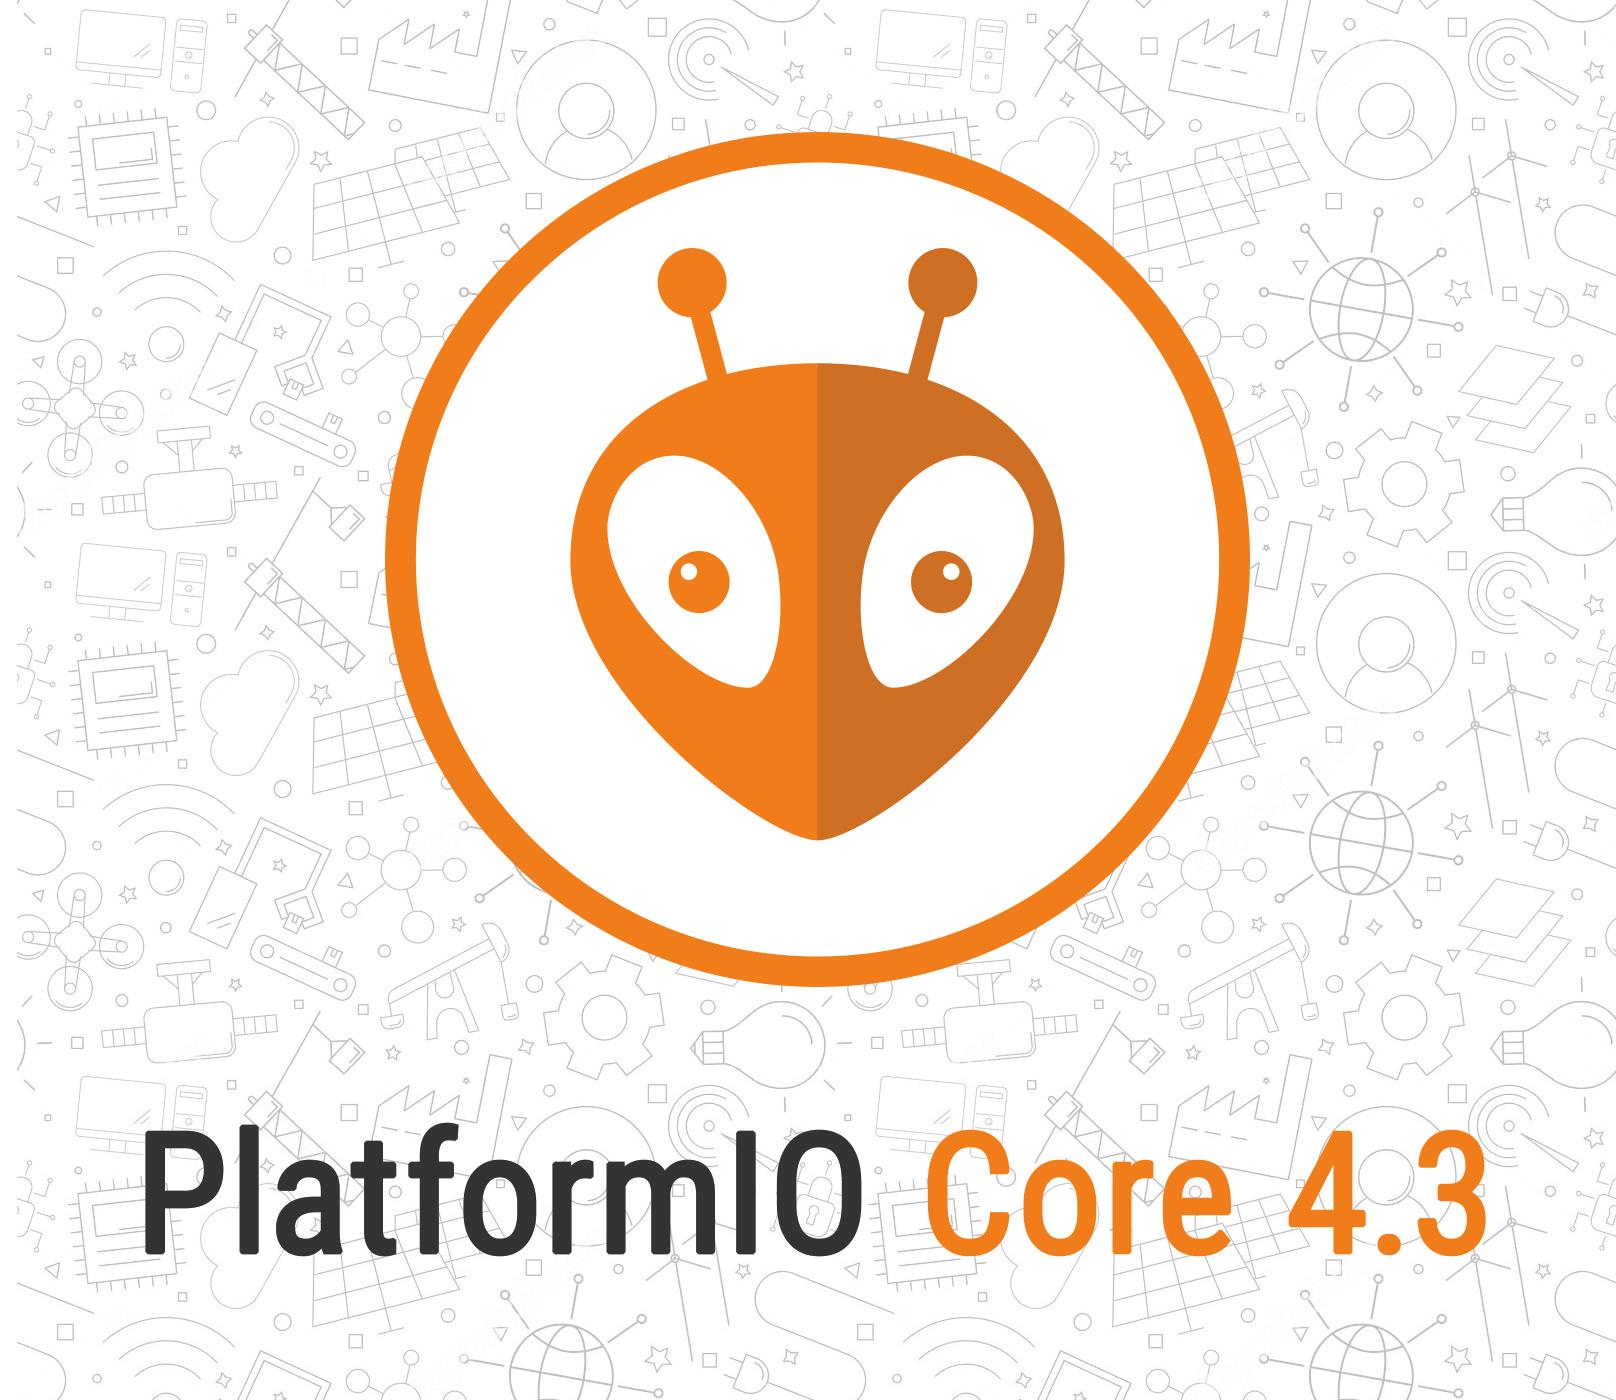 platformio_core_4.3